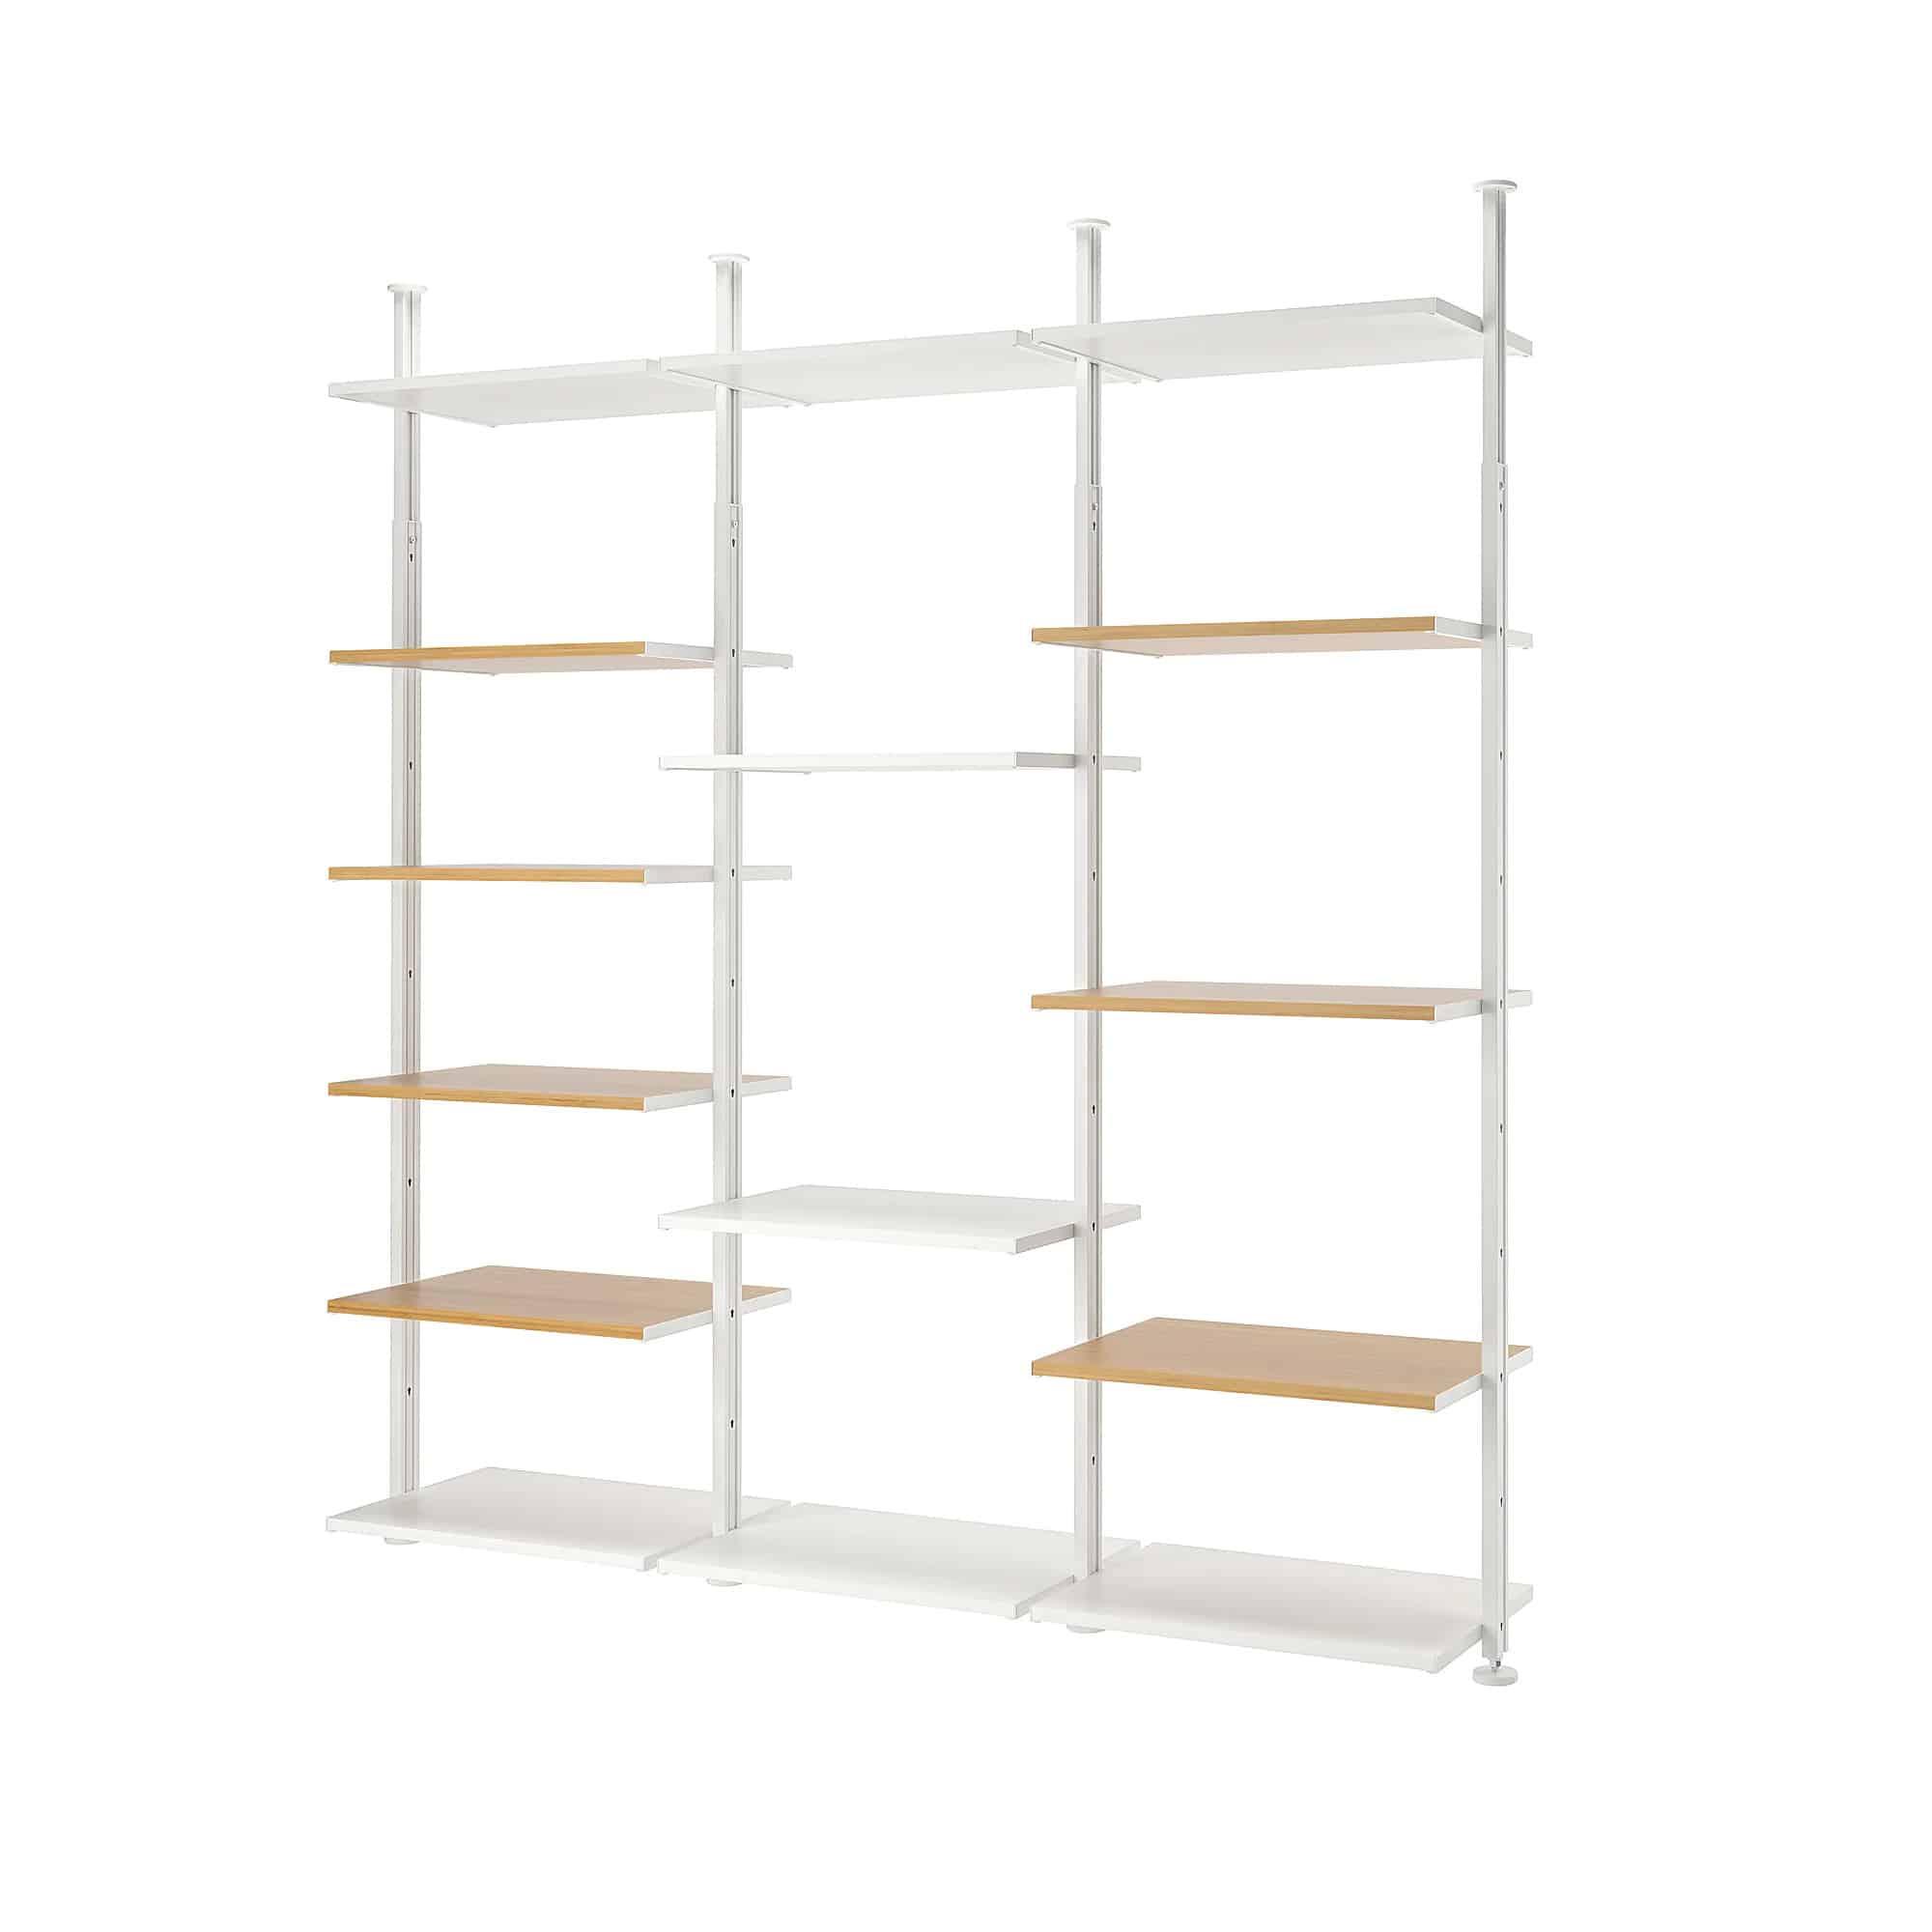 Elvarli 3 elementen bamboe opbergkast van Ikea